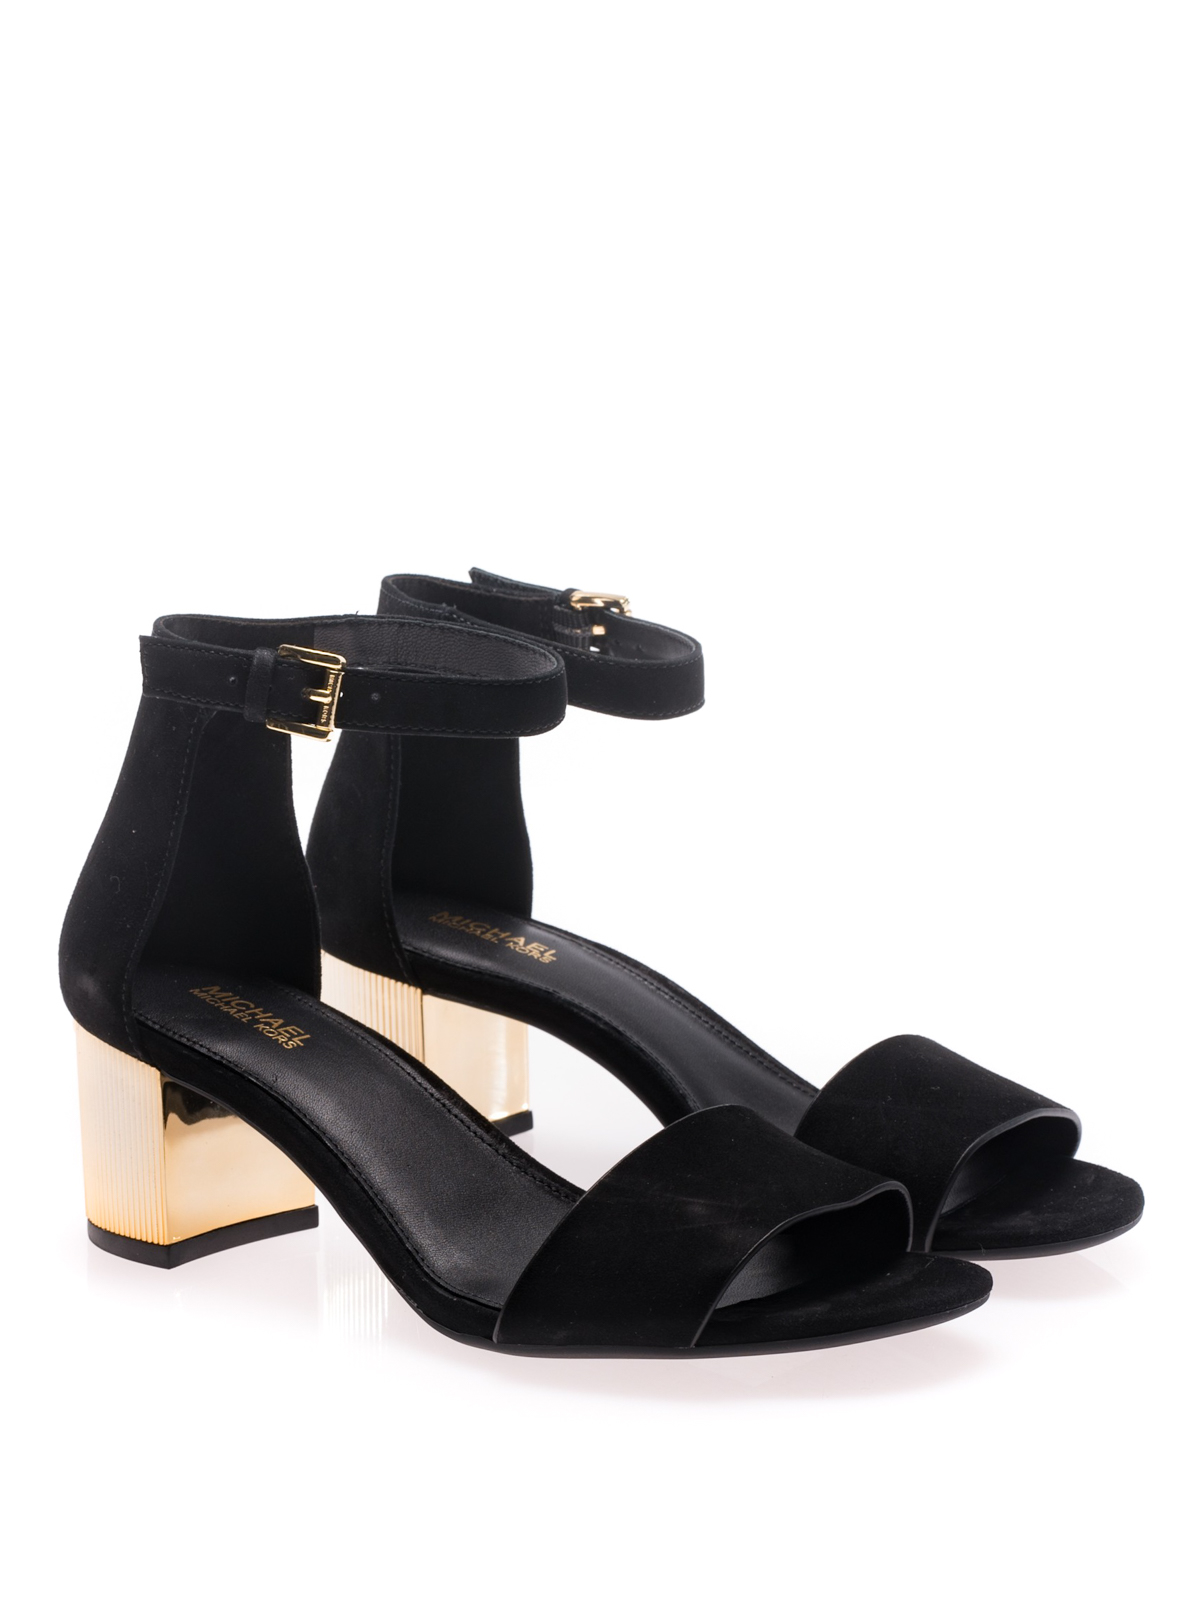 Michael Kors - Paloma Flex gold heel